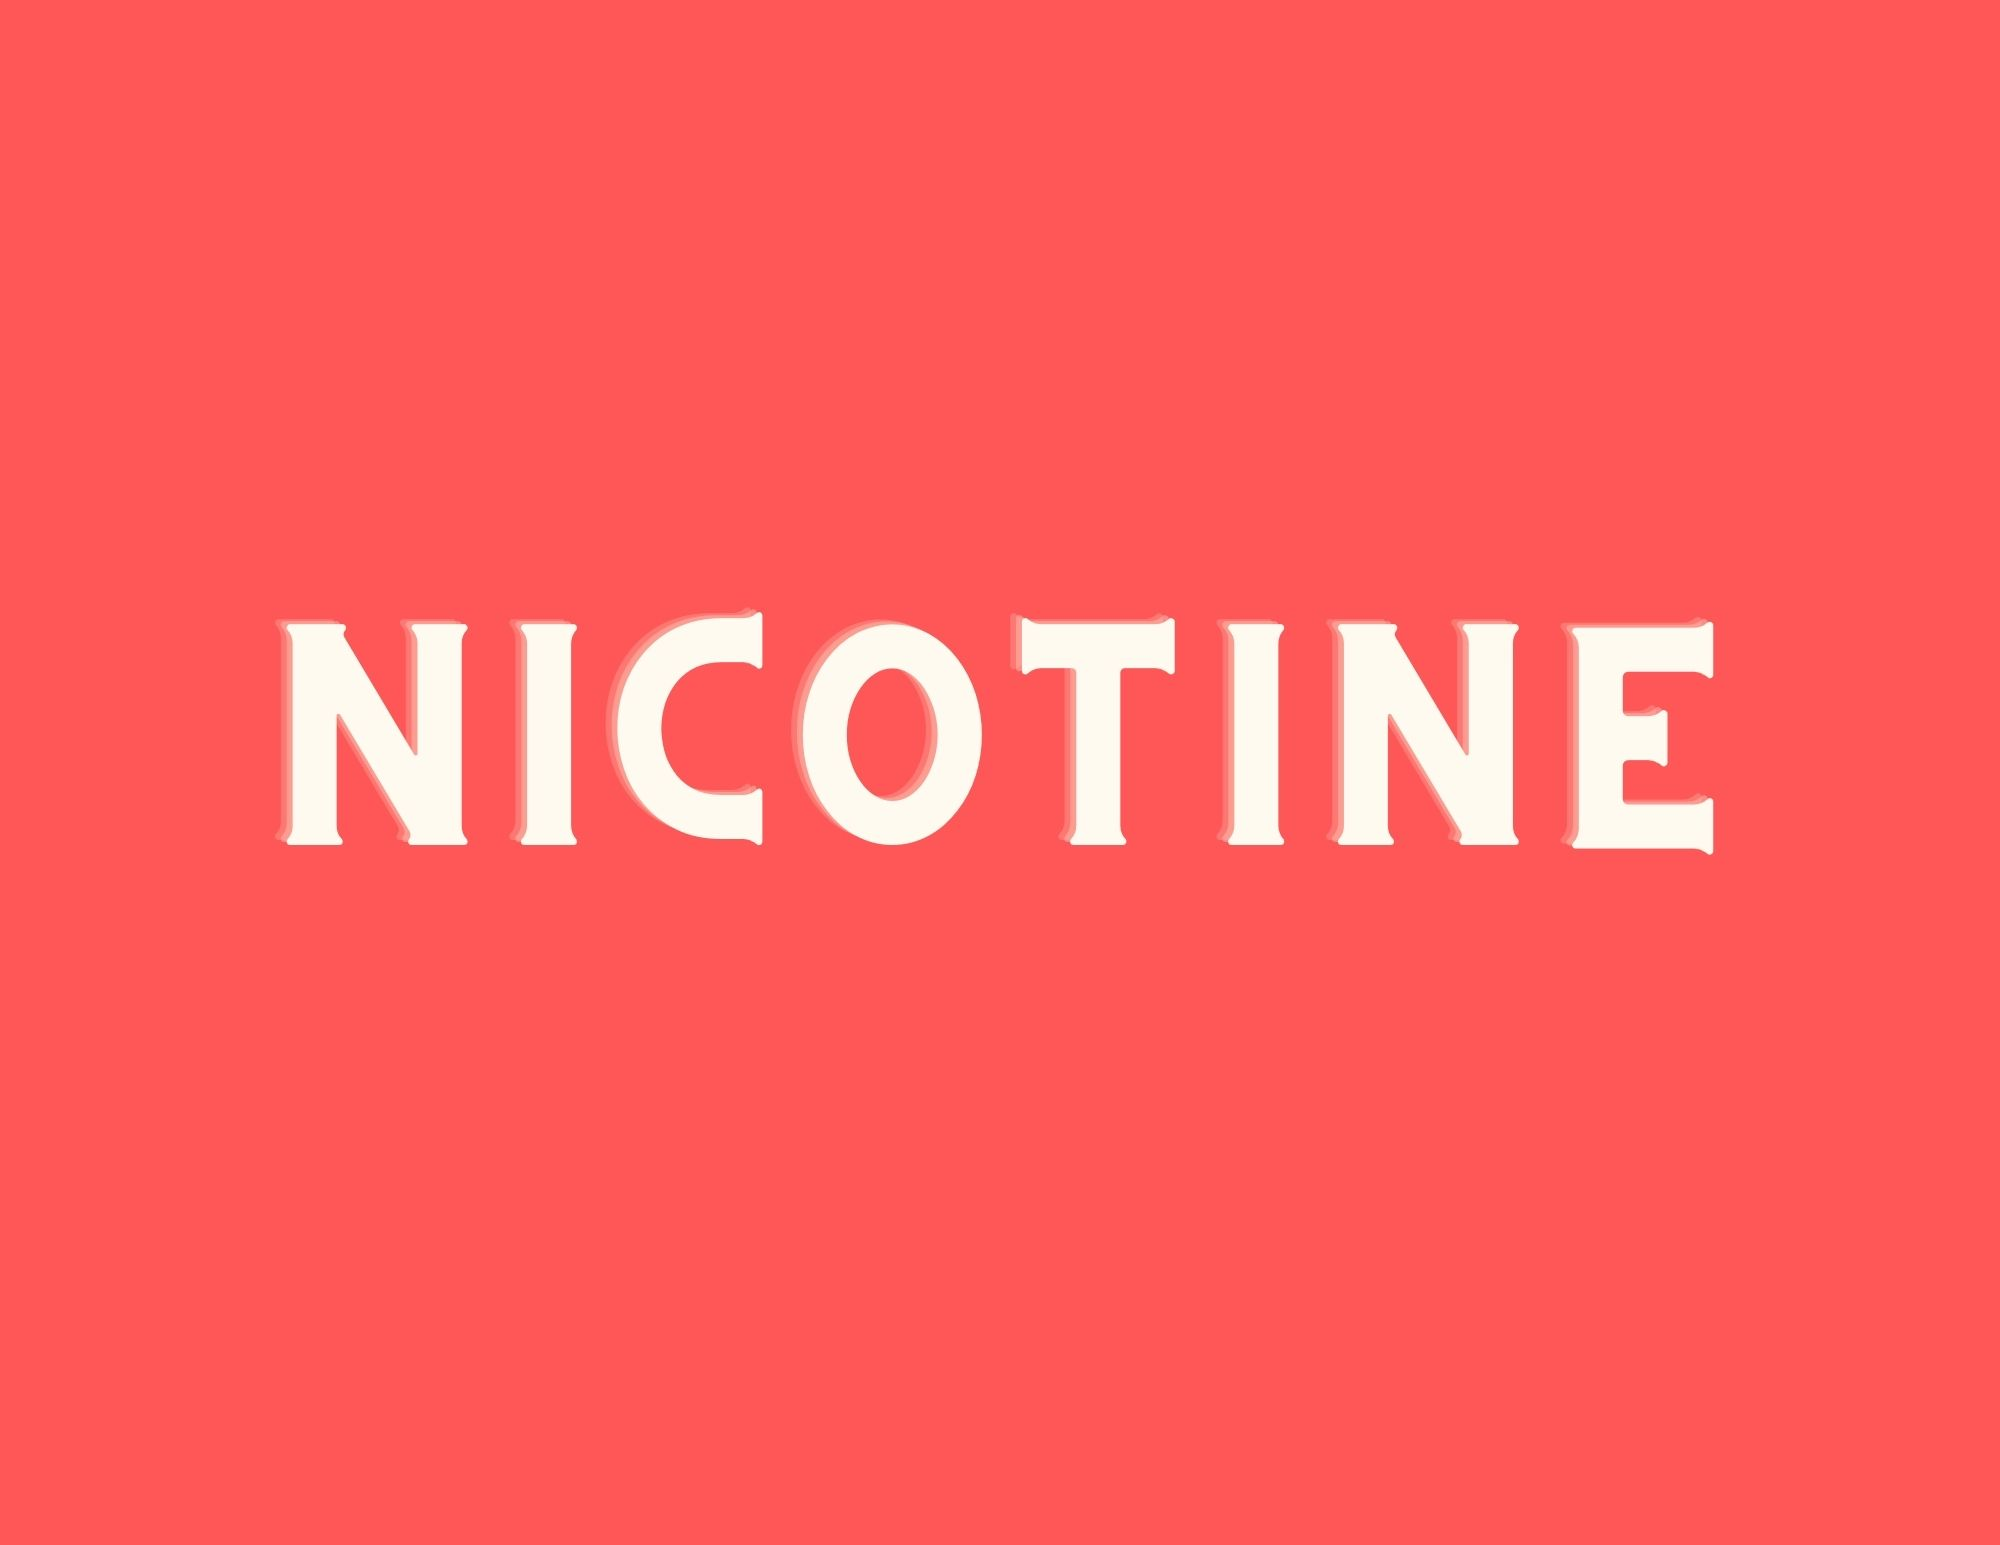 """nicotine"" icon"